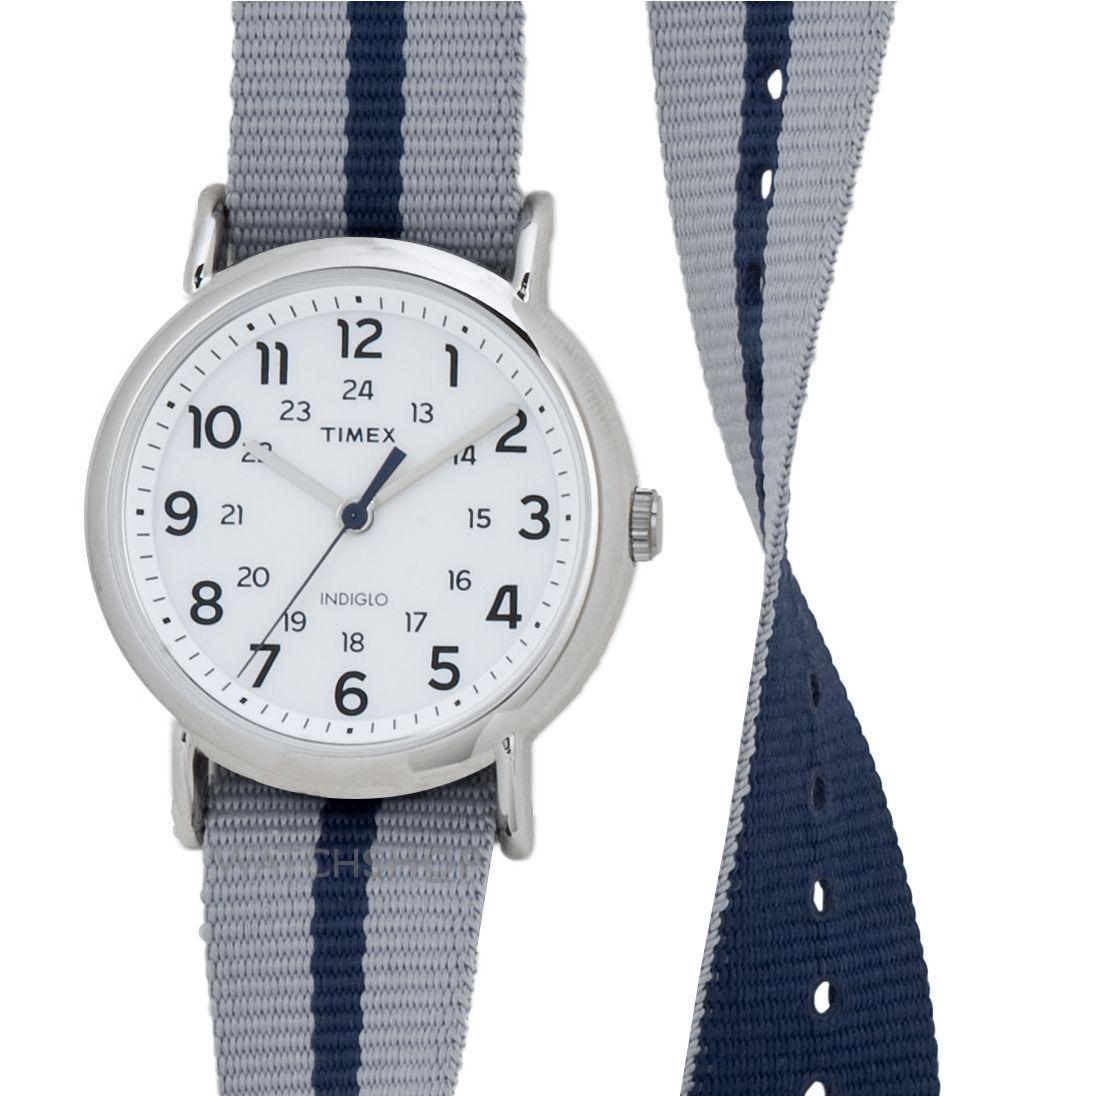 orologio Timex uomo TW2P72300  Mod WEEKENDER